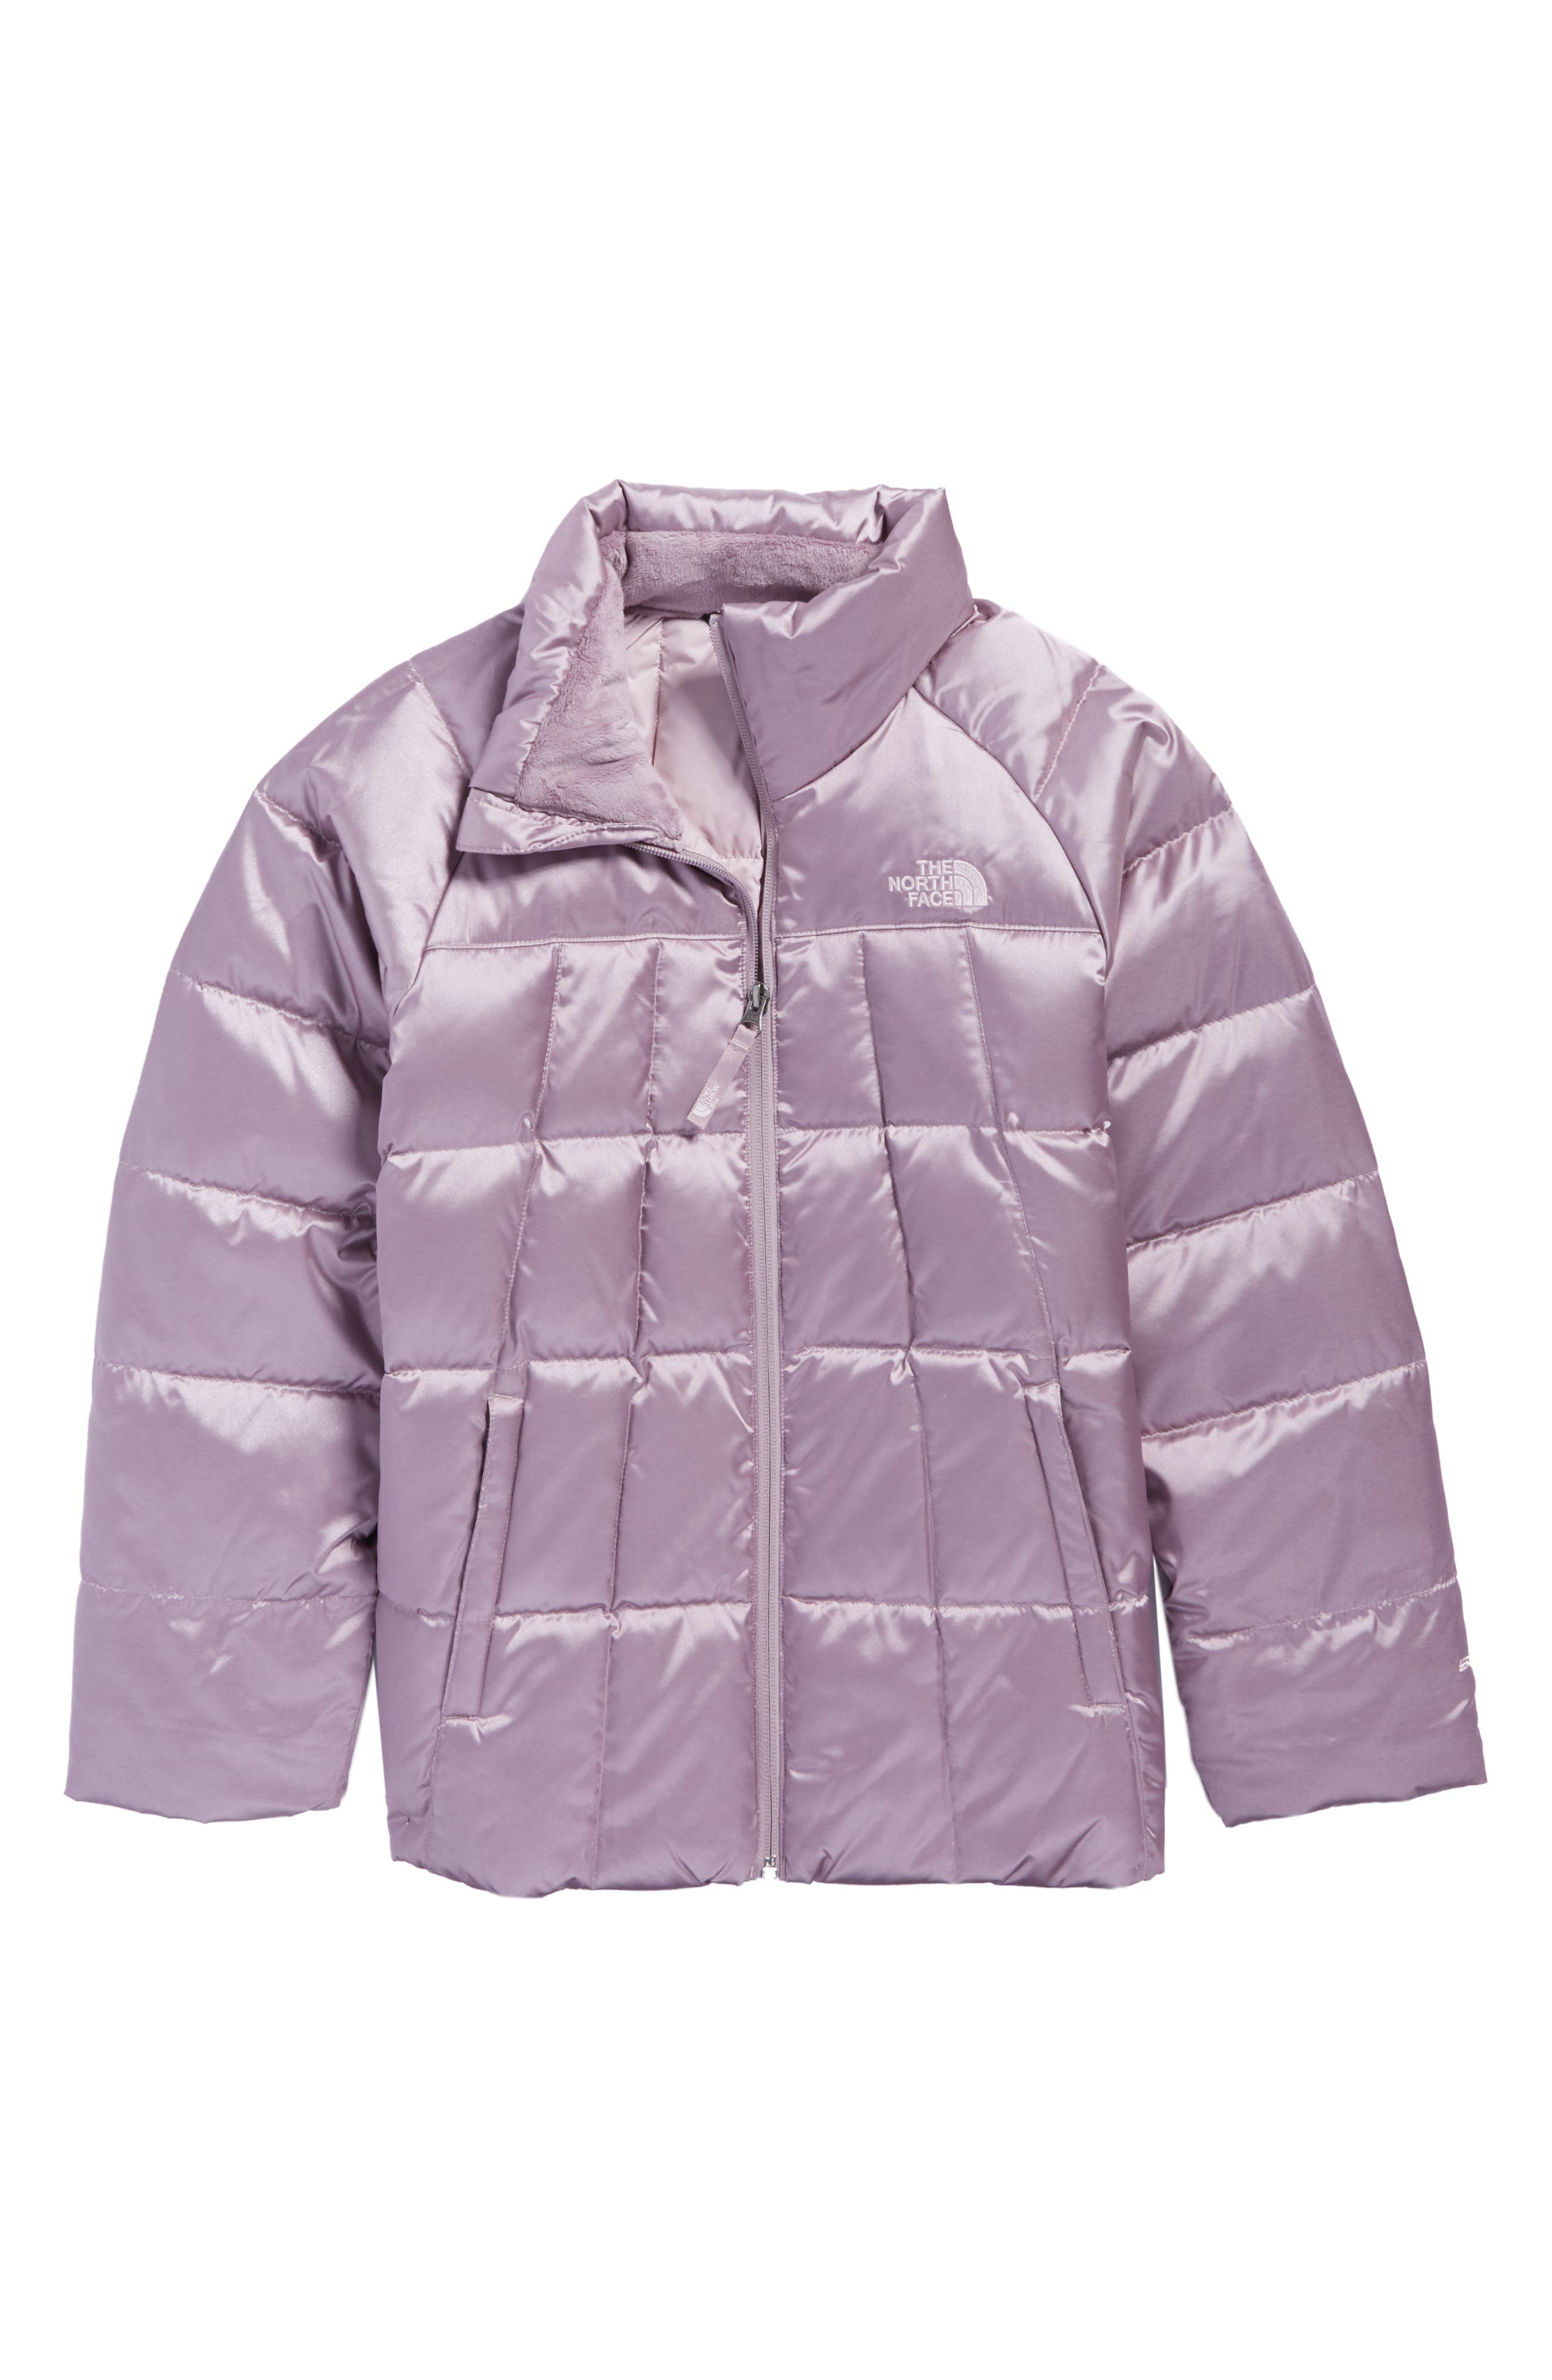 Aconcagua Down Jacket,                         Main,                         color, Quail Grey